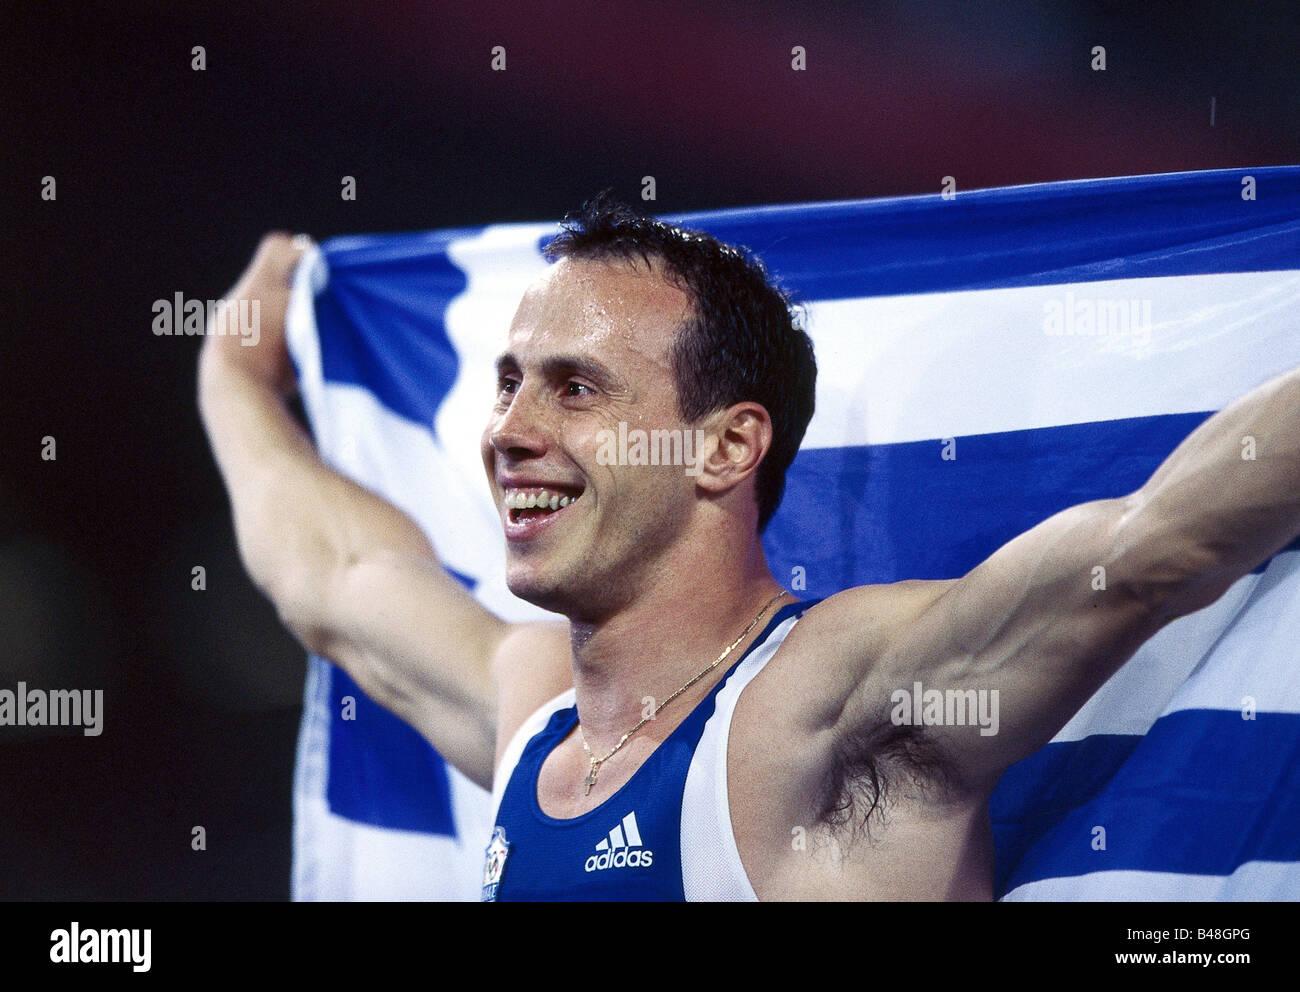 Konstantinos, Kenteris, * 11.7.1973, Greek athlete (athletics), portrait, Olympic Games, Sydney, 2000, Additional - Stock Image